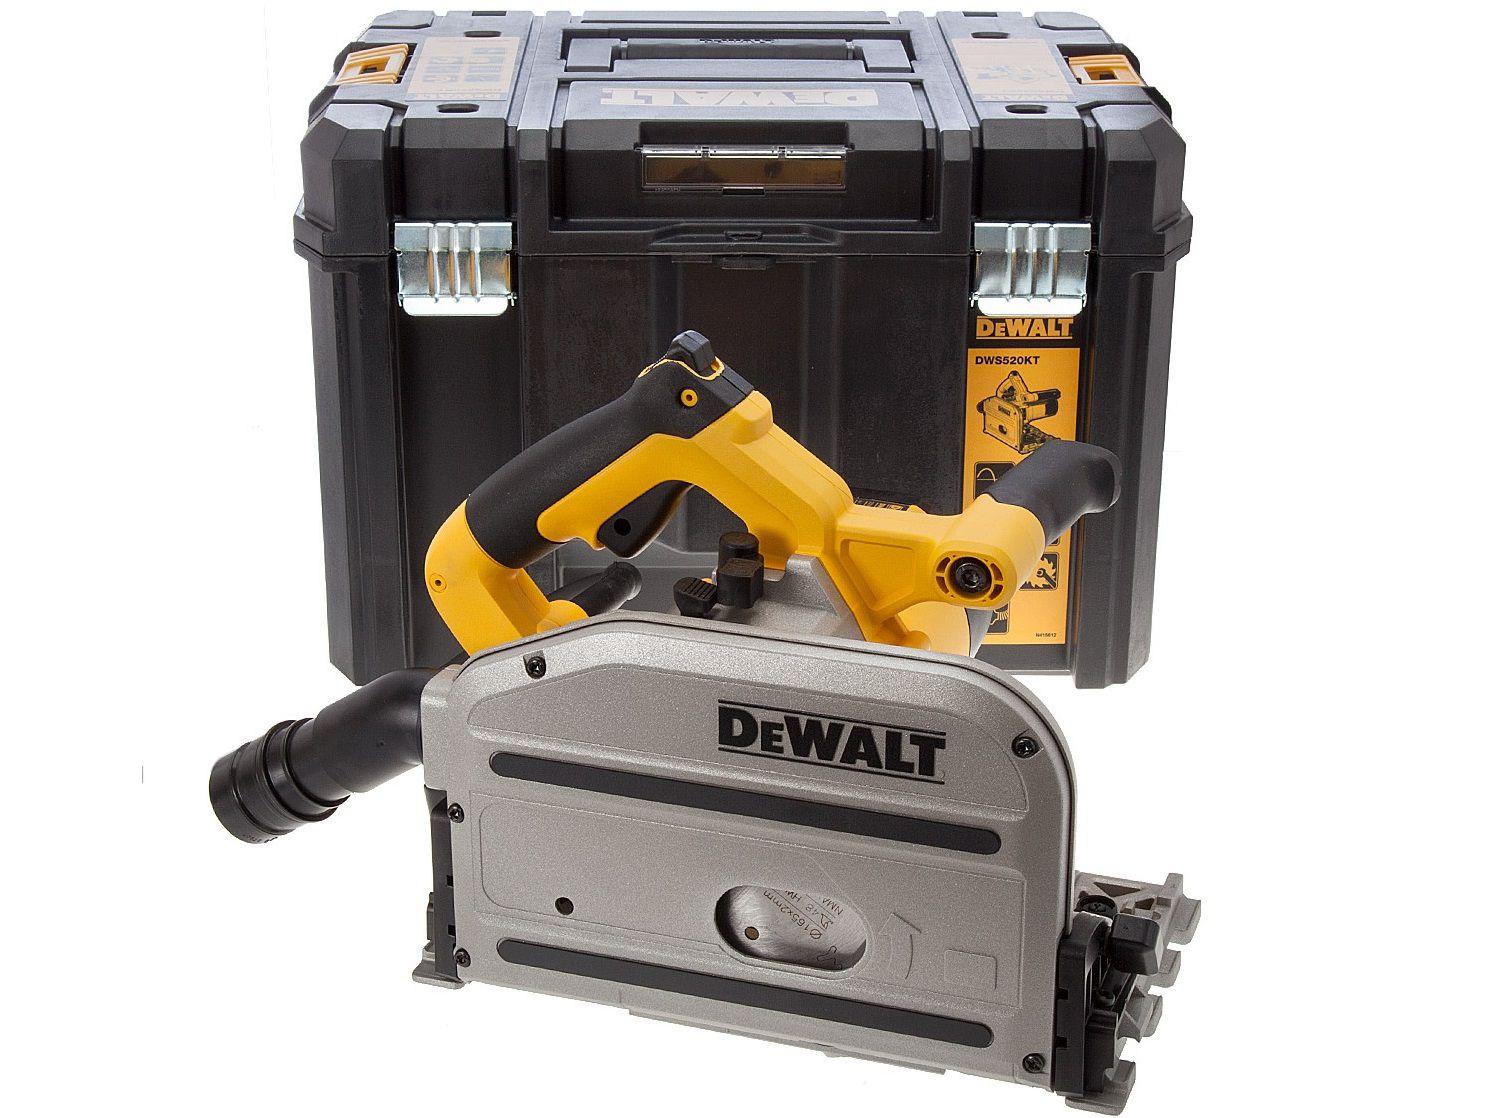 Ponorná kotoučová pila DeWalt DWS520KT - 1300W, 165mm, 5.6kg, pilový kotouč, v kufru (DWS520KT-QS)